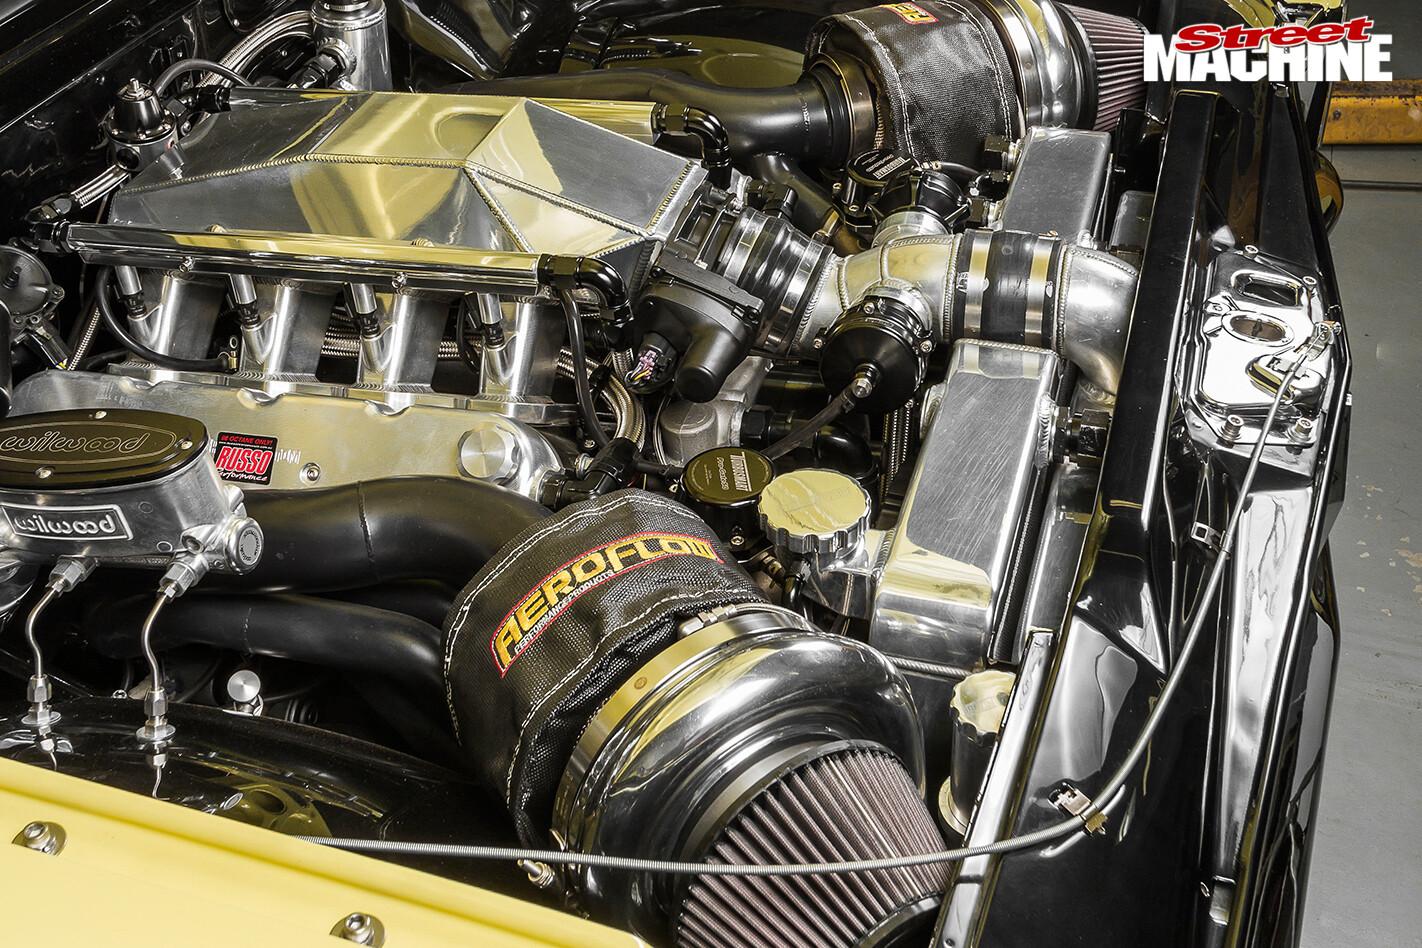 Holden -hk -monaro -engine -bay -2